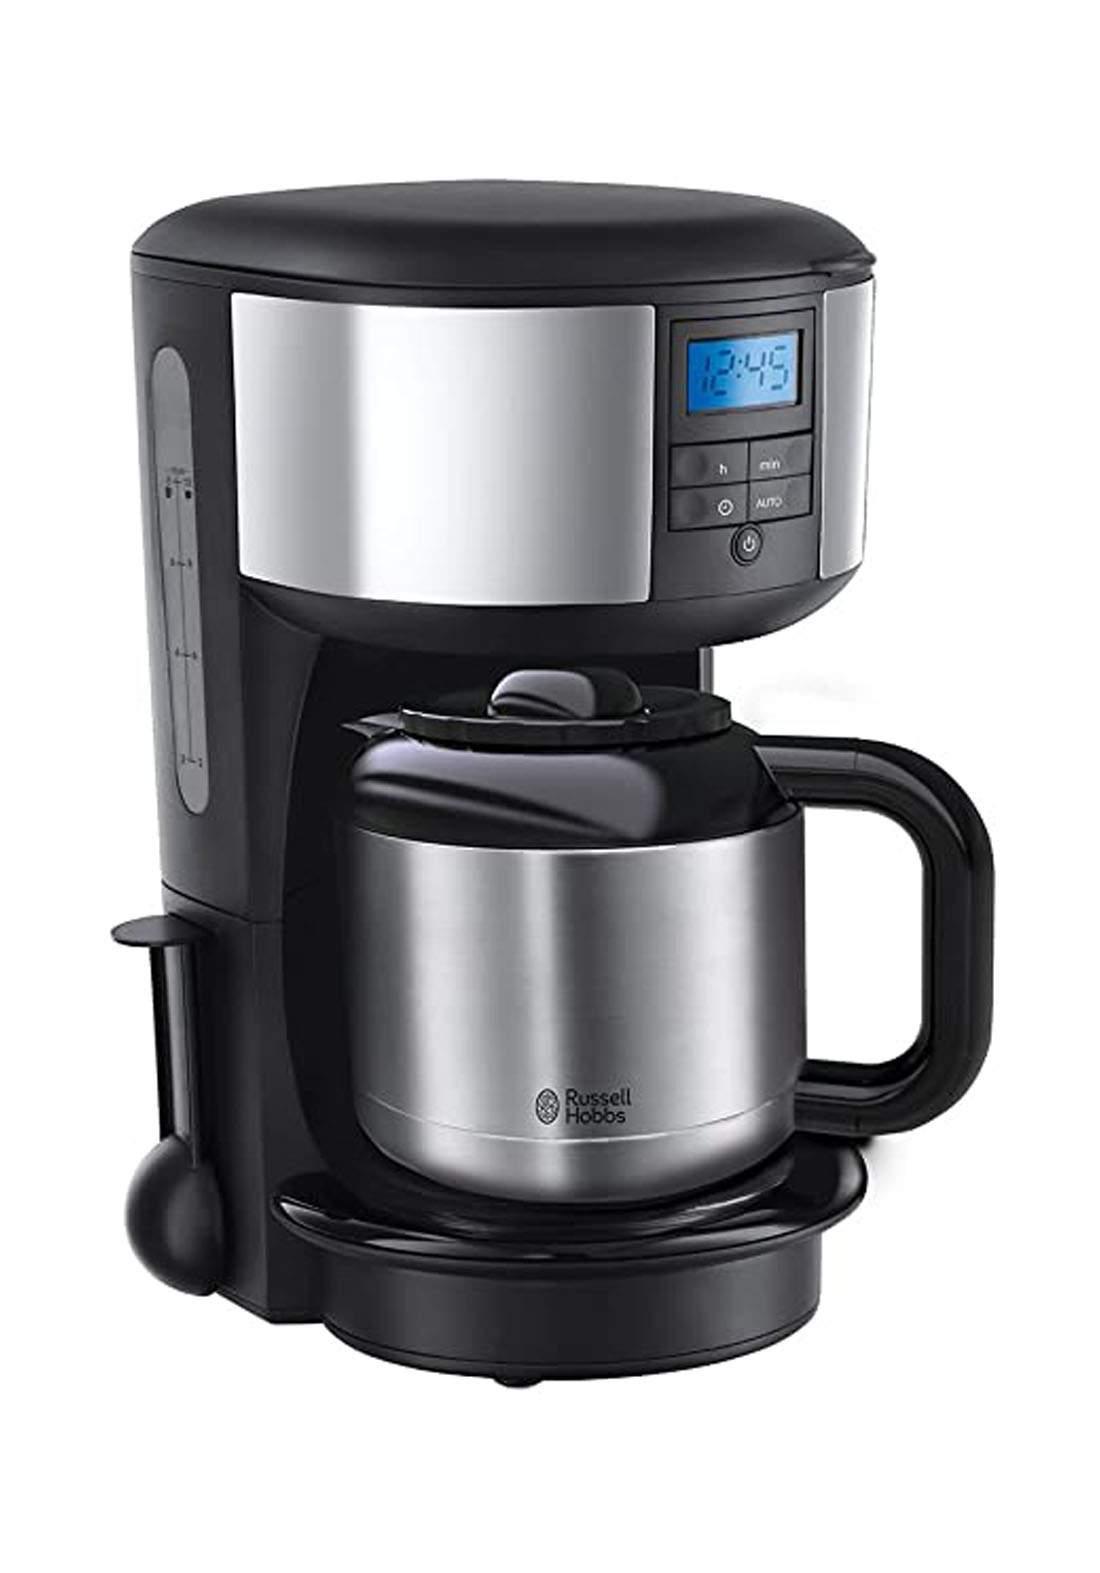 Russell hobbs 20670  Electrical kettle  غلاية